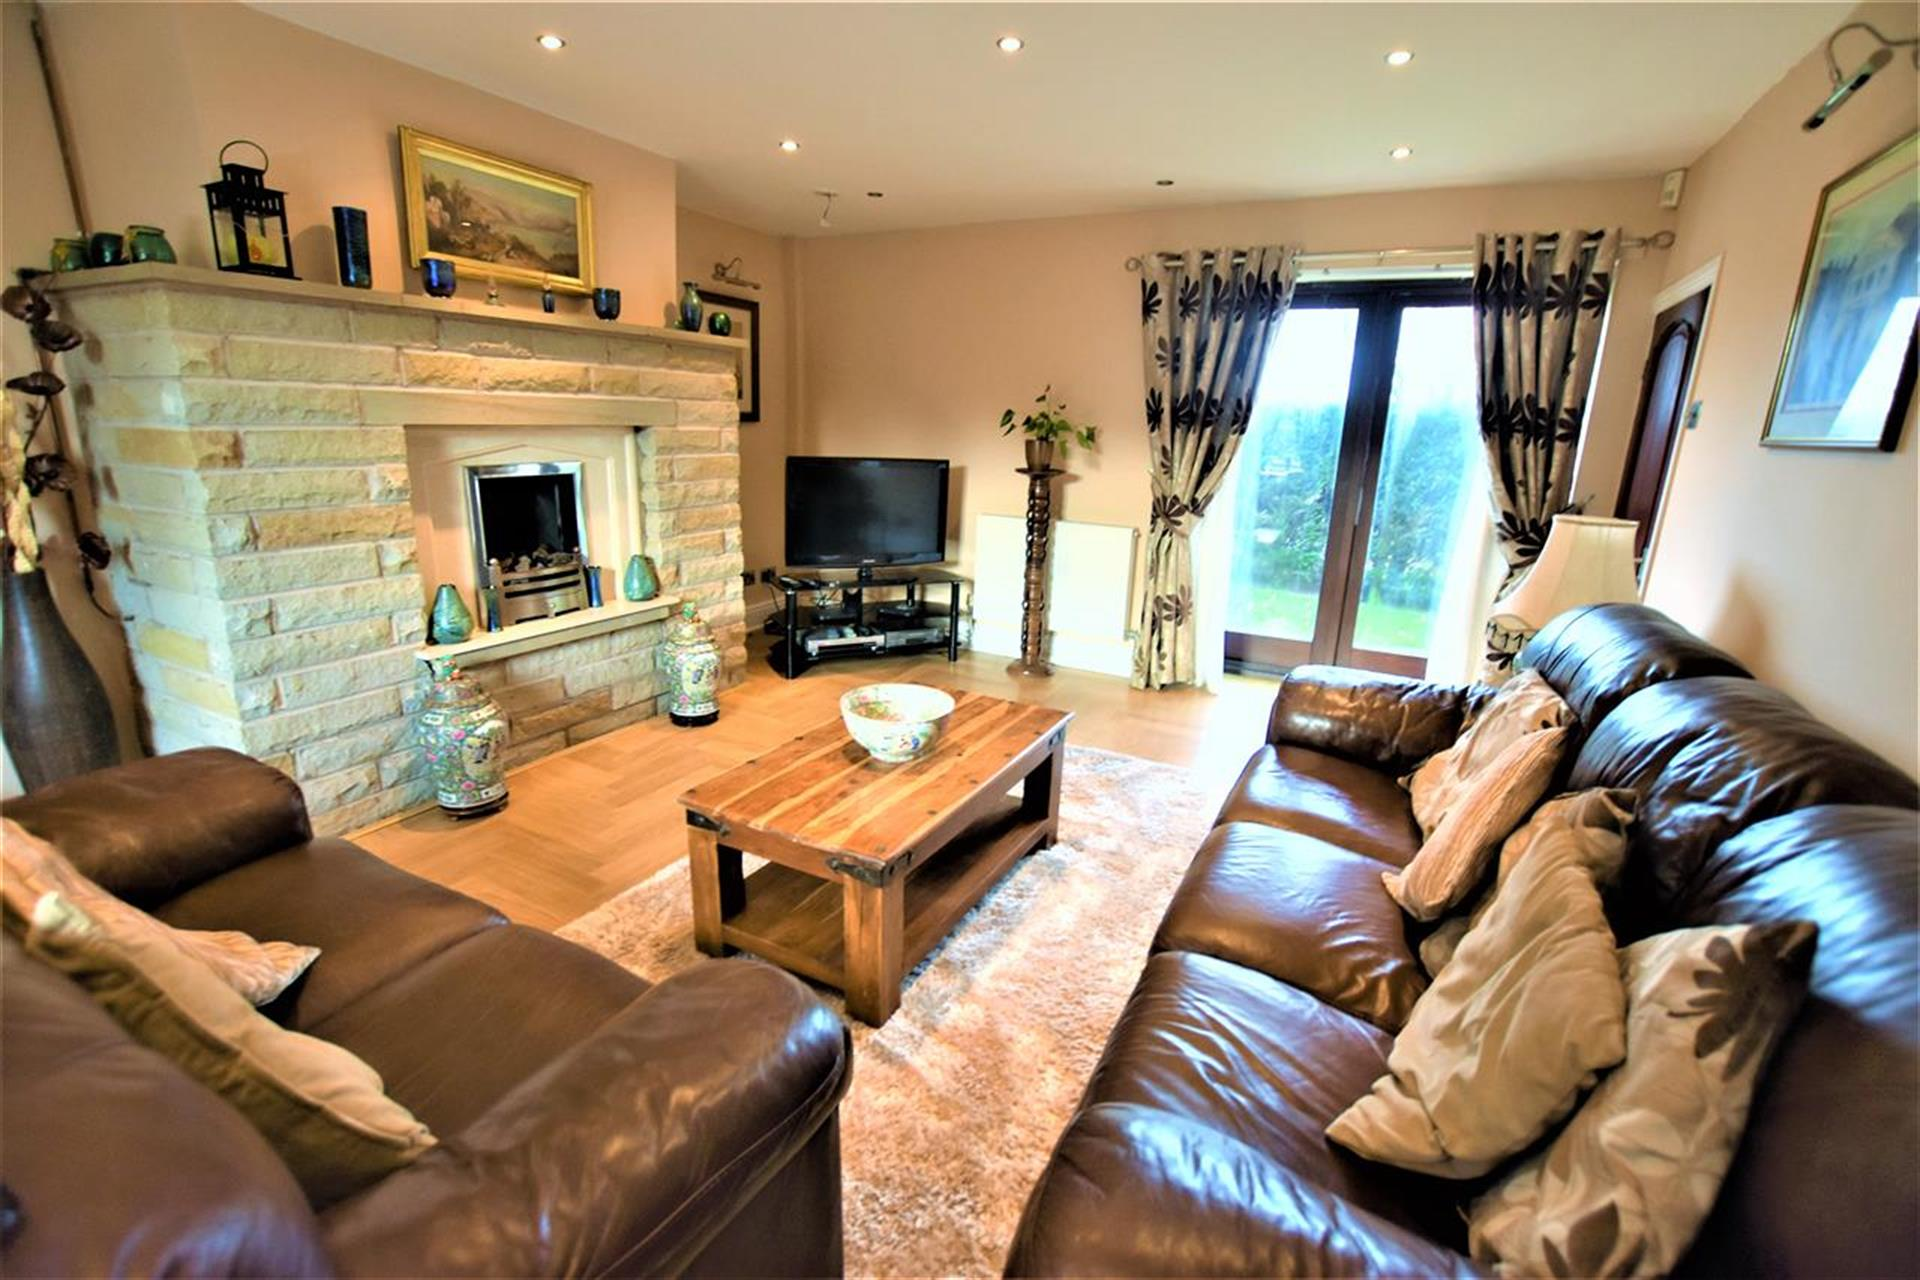 4 Bedroom Detached House For Sale - Reception Room 2